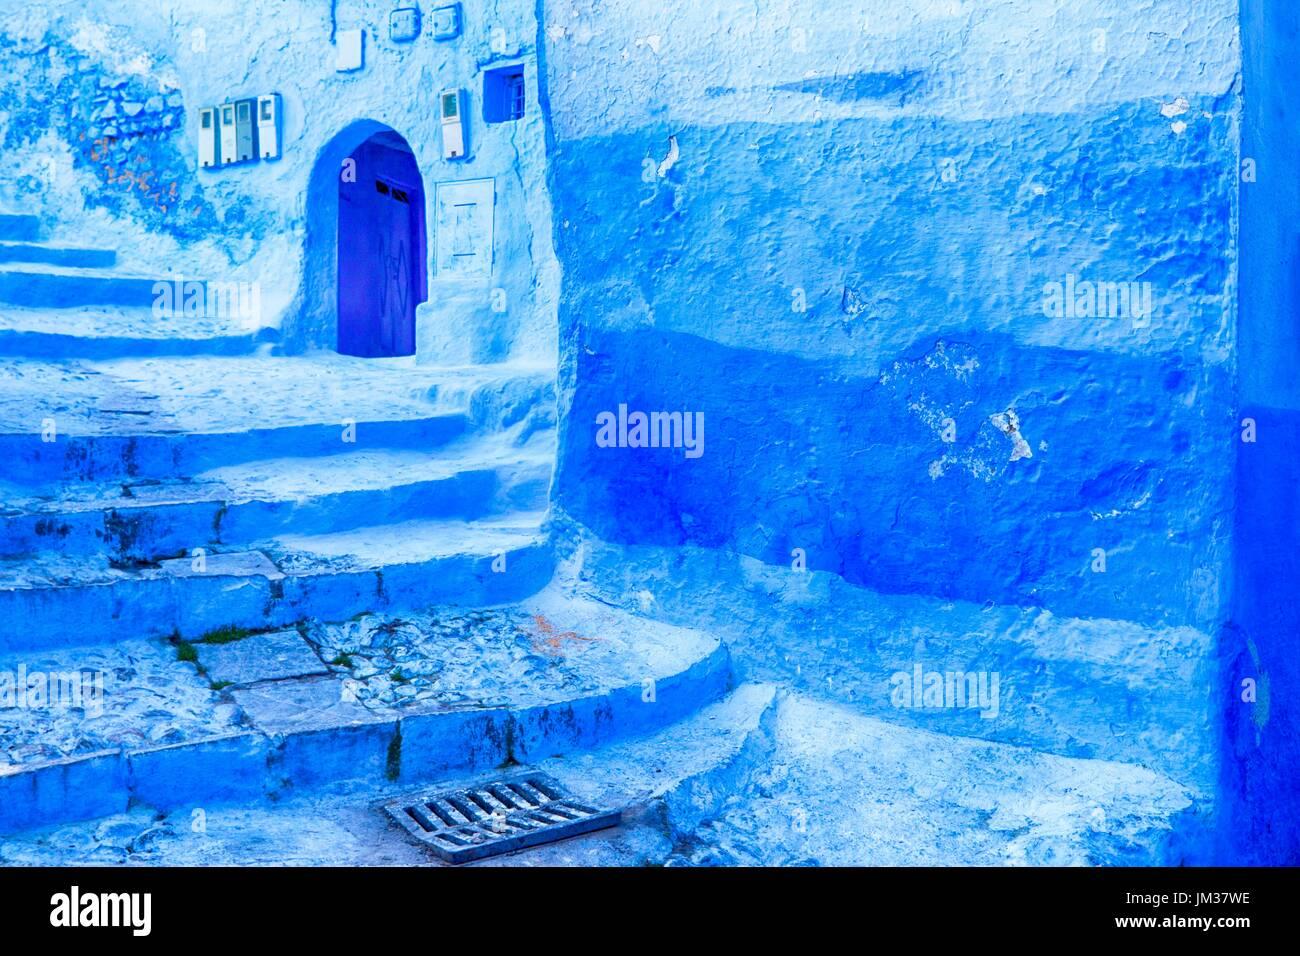 The Blue City, Morocco Stock Photo